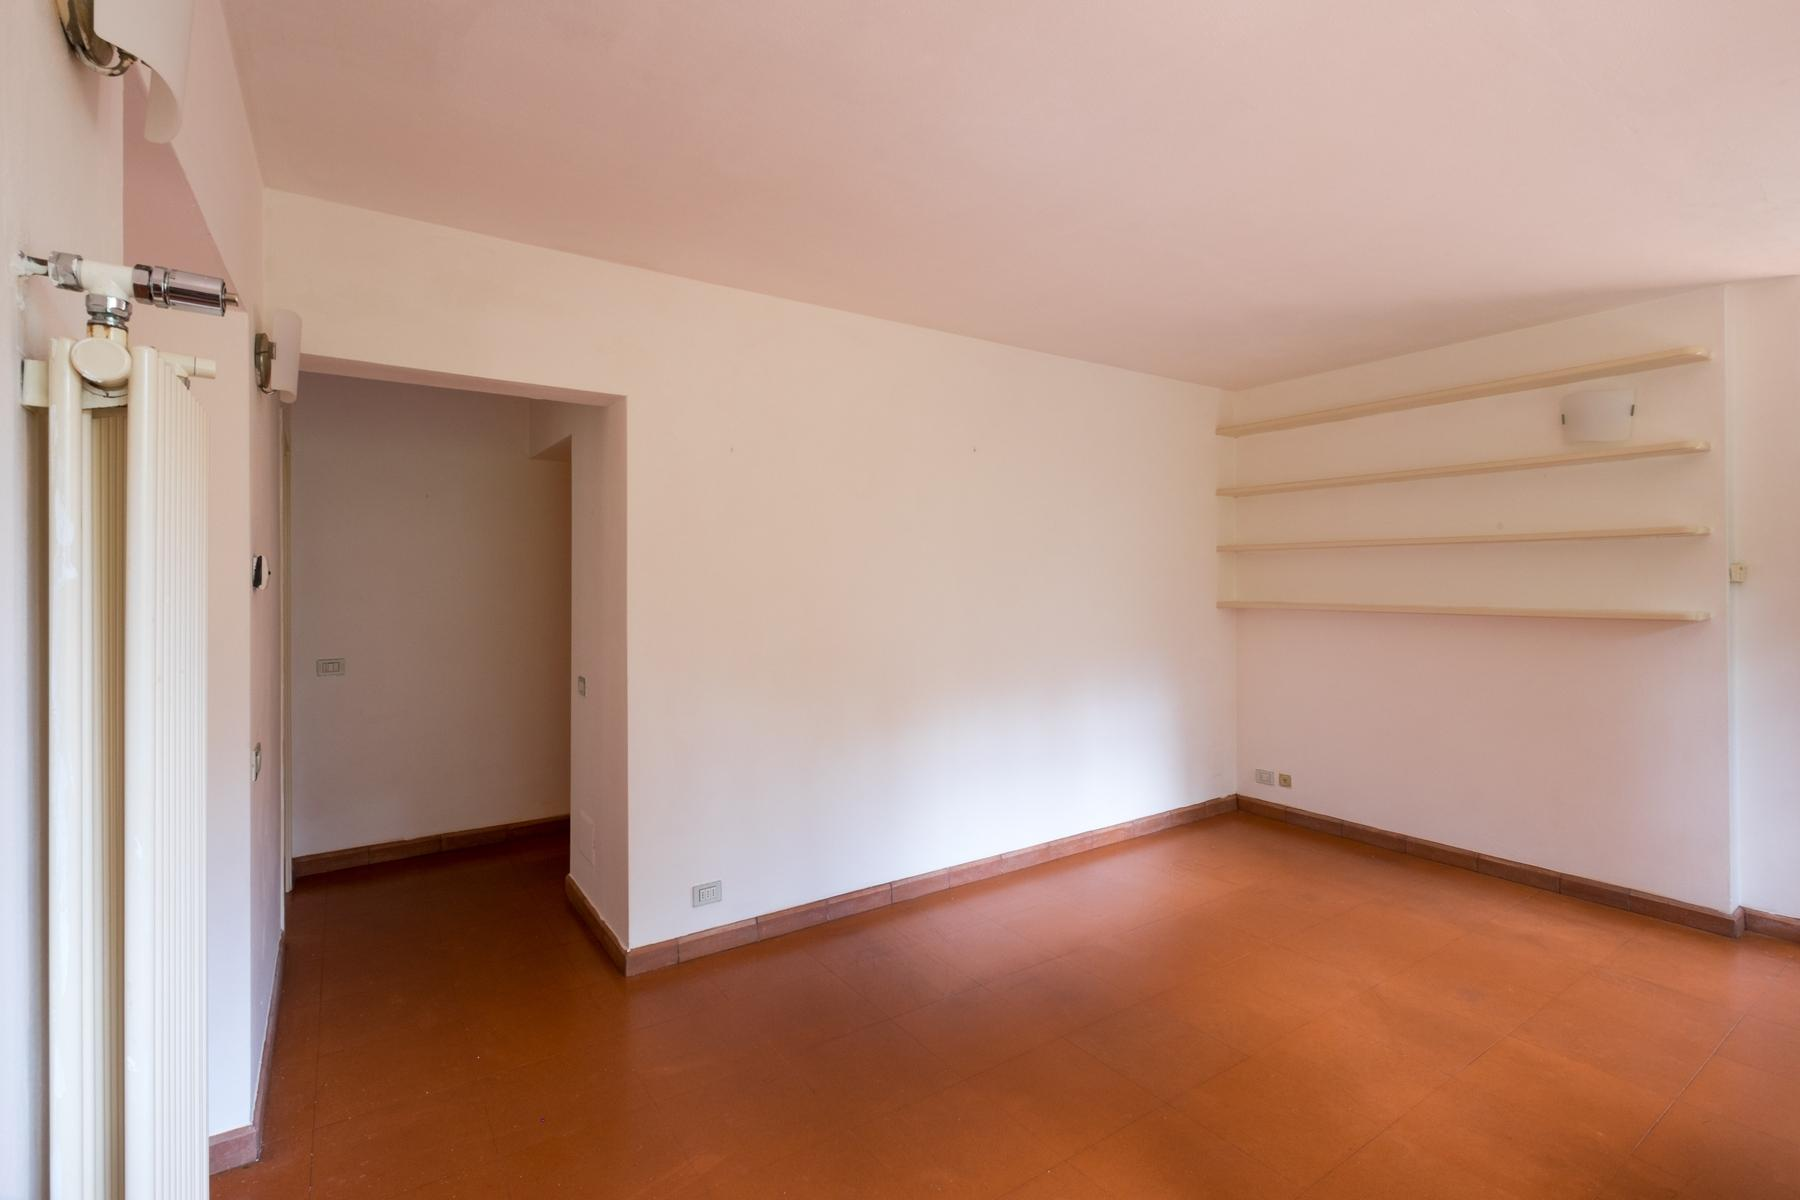 Lovely apartment in exclusive Poggio Imperiale area - 4